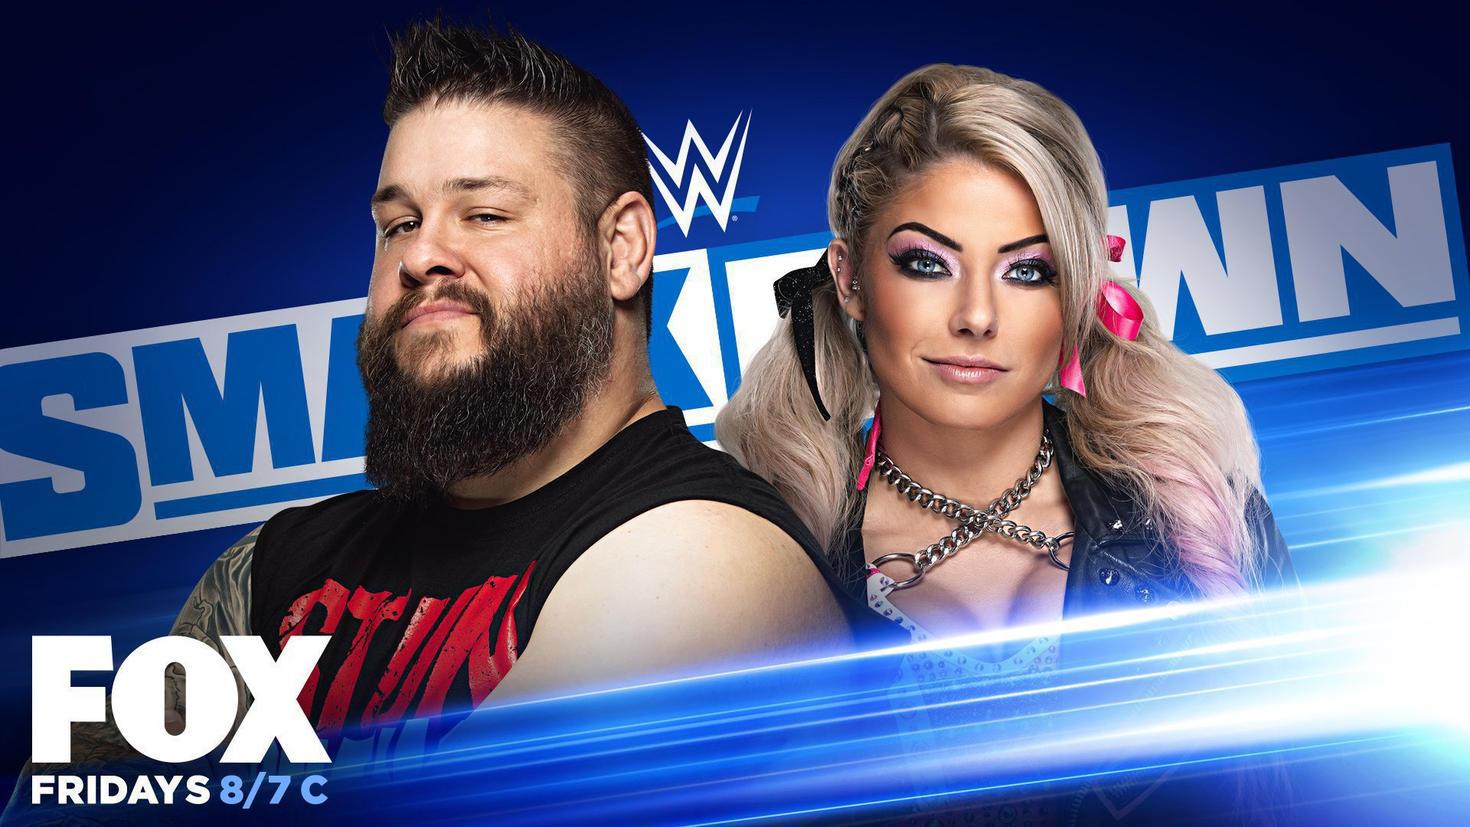 WWE Smackdown Preview (02/10/20): Roman Reigns; KO Show; Title Match 2